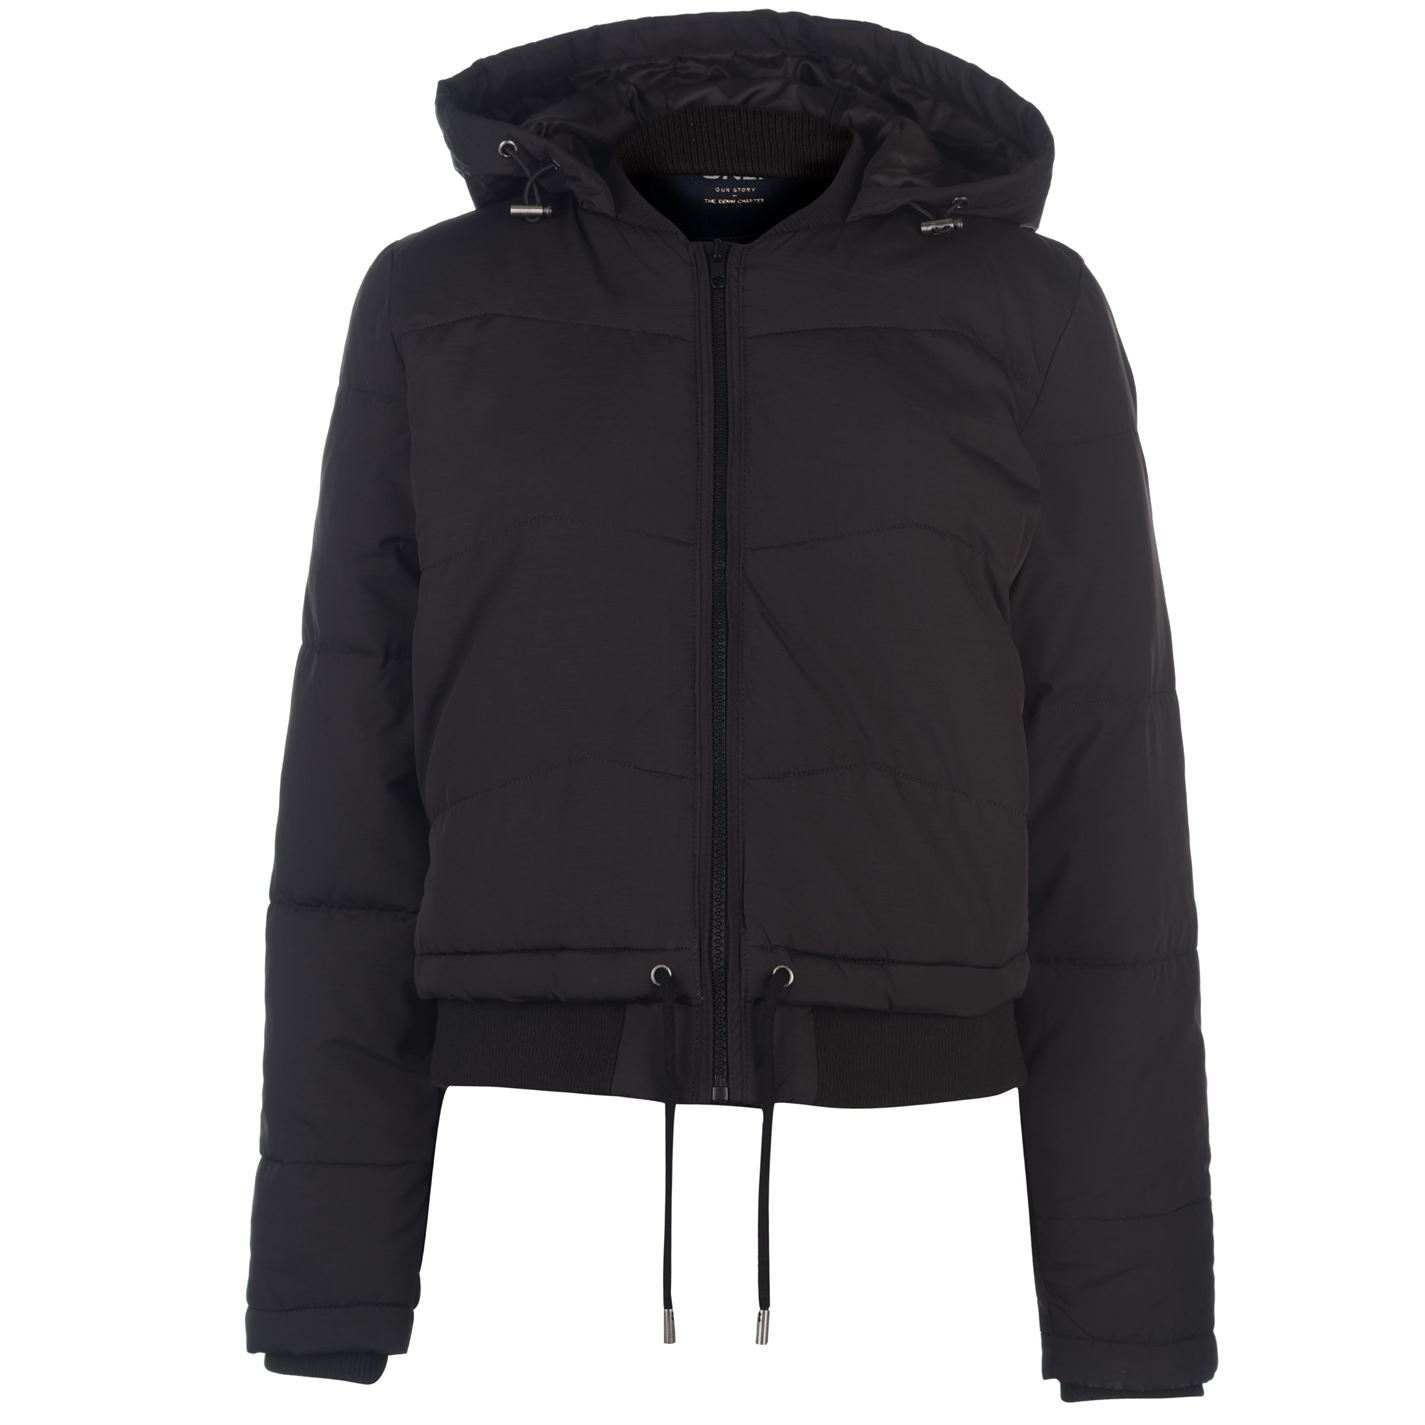 ec80d6252 Details about Only Aida Short Puffer Jacket Womens Black Coats Outerwear